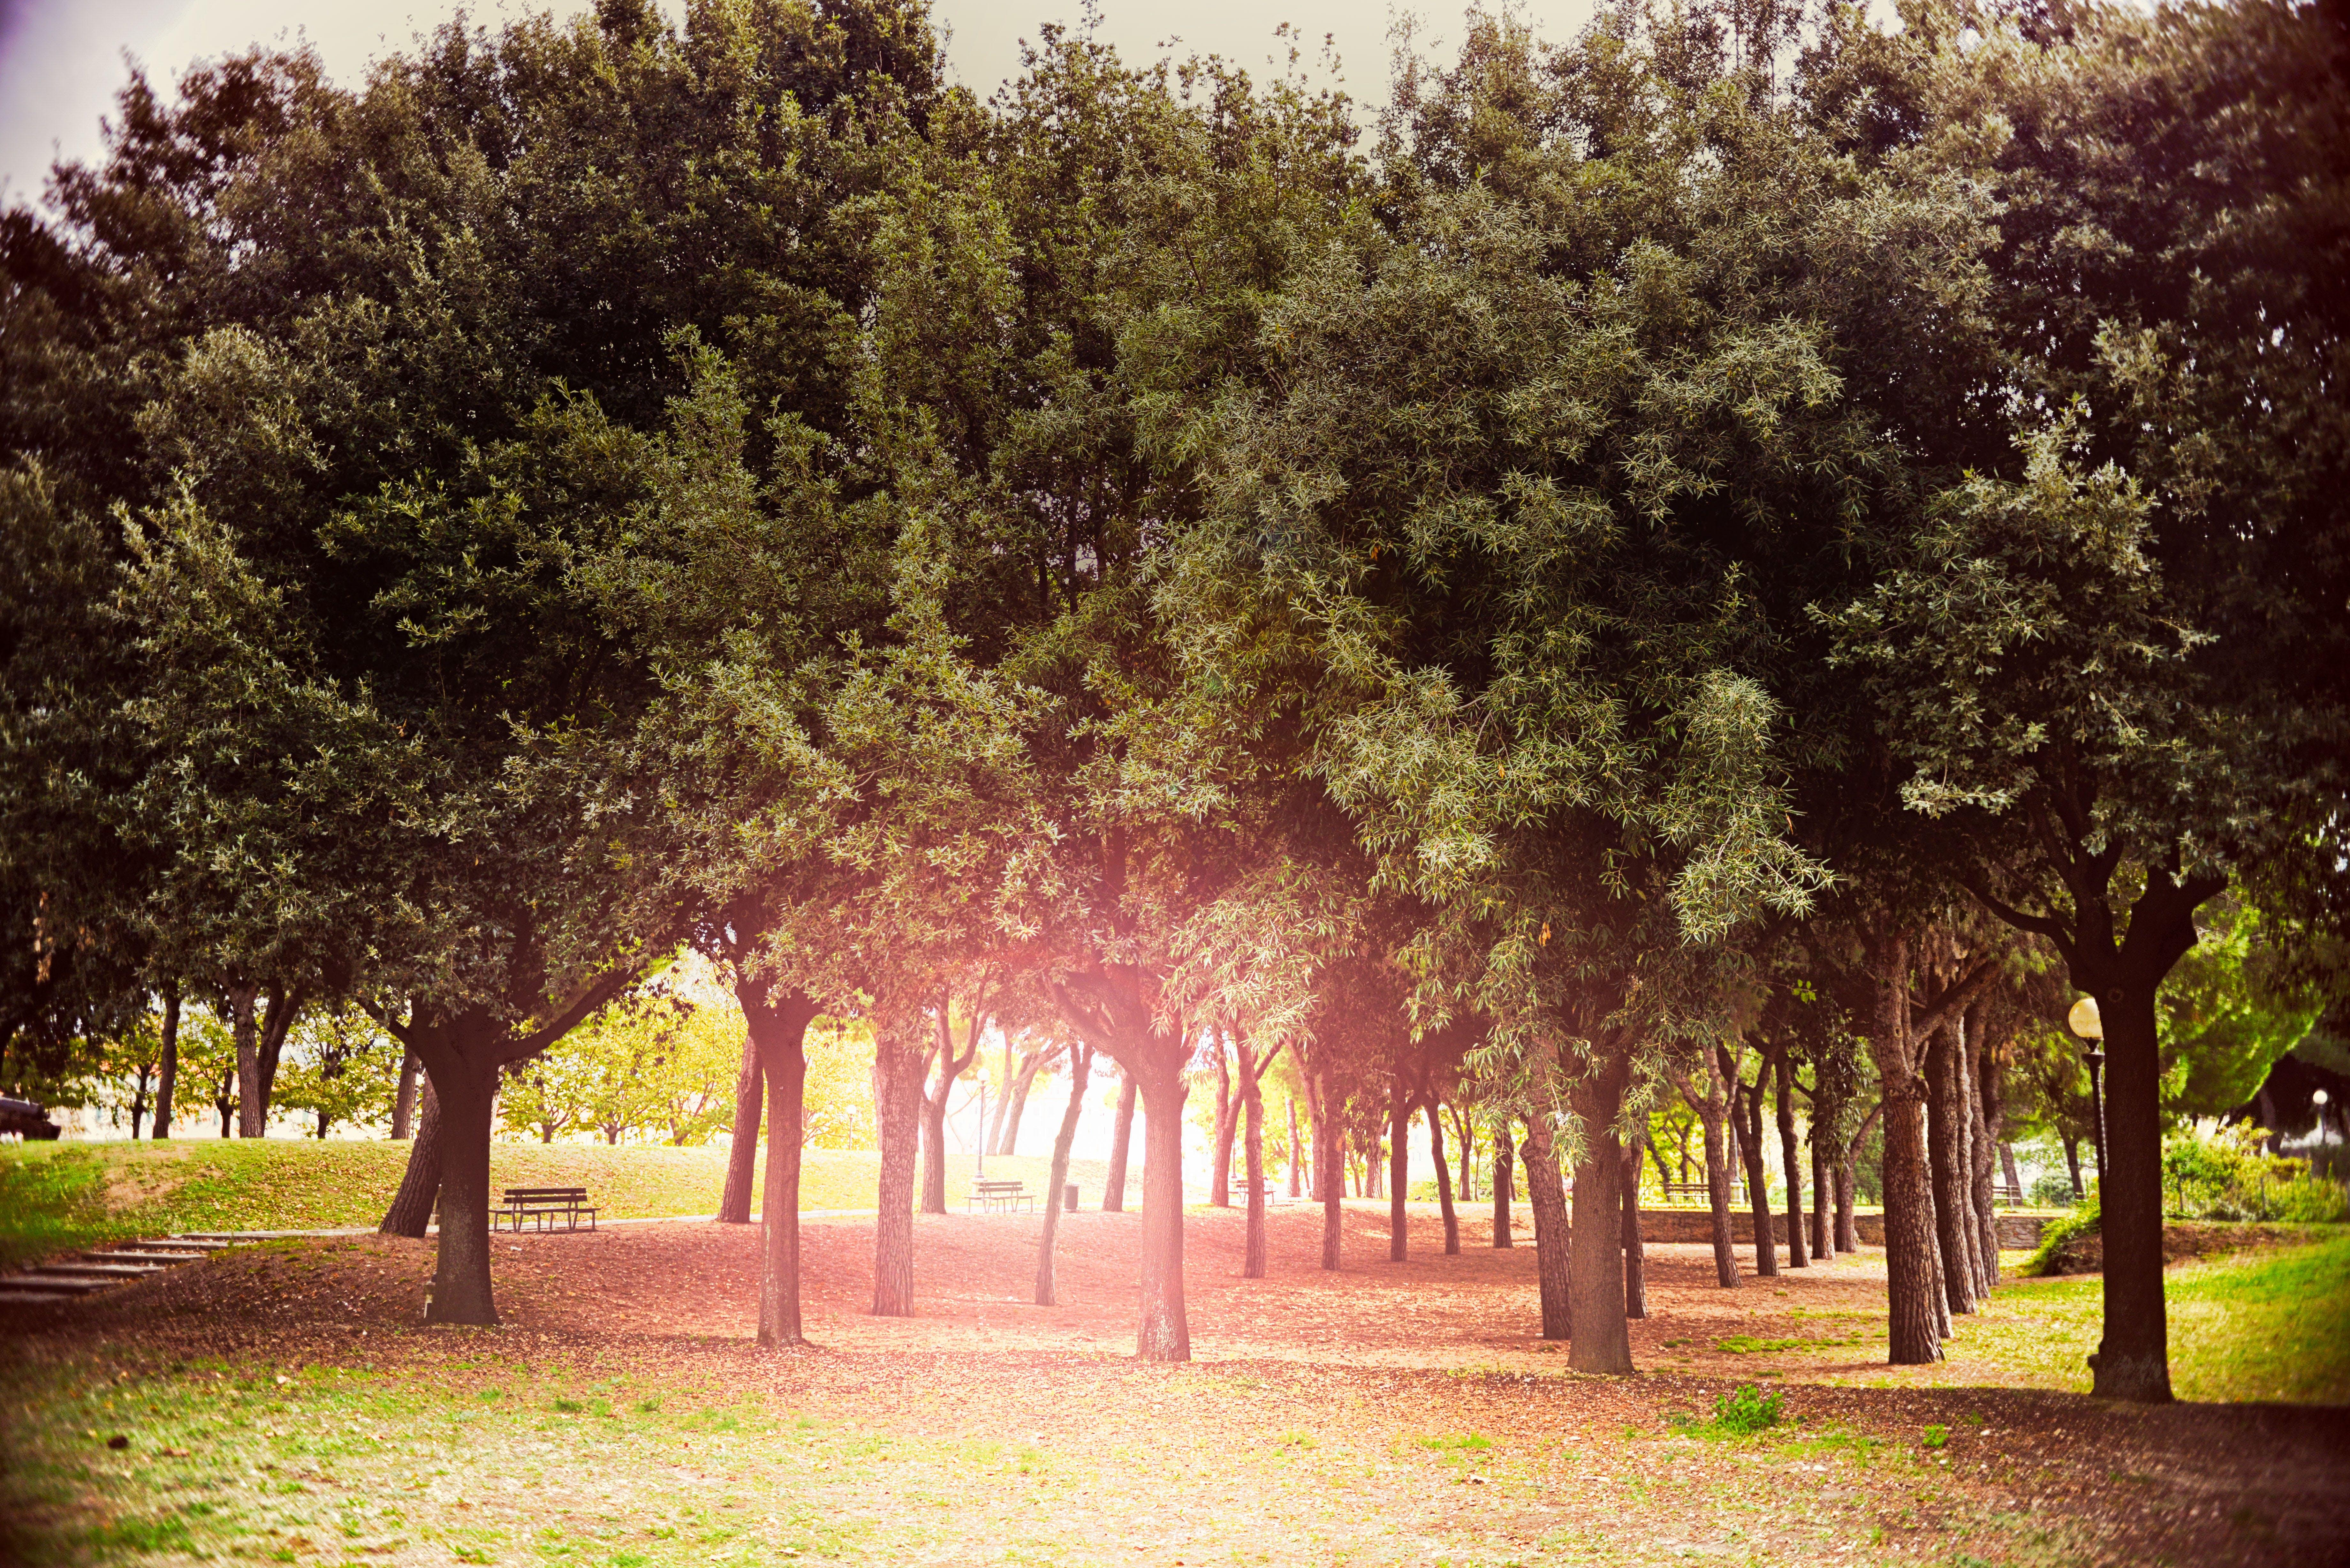 grass, lawn, park